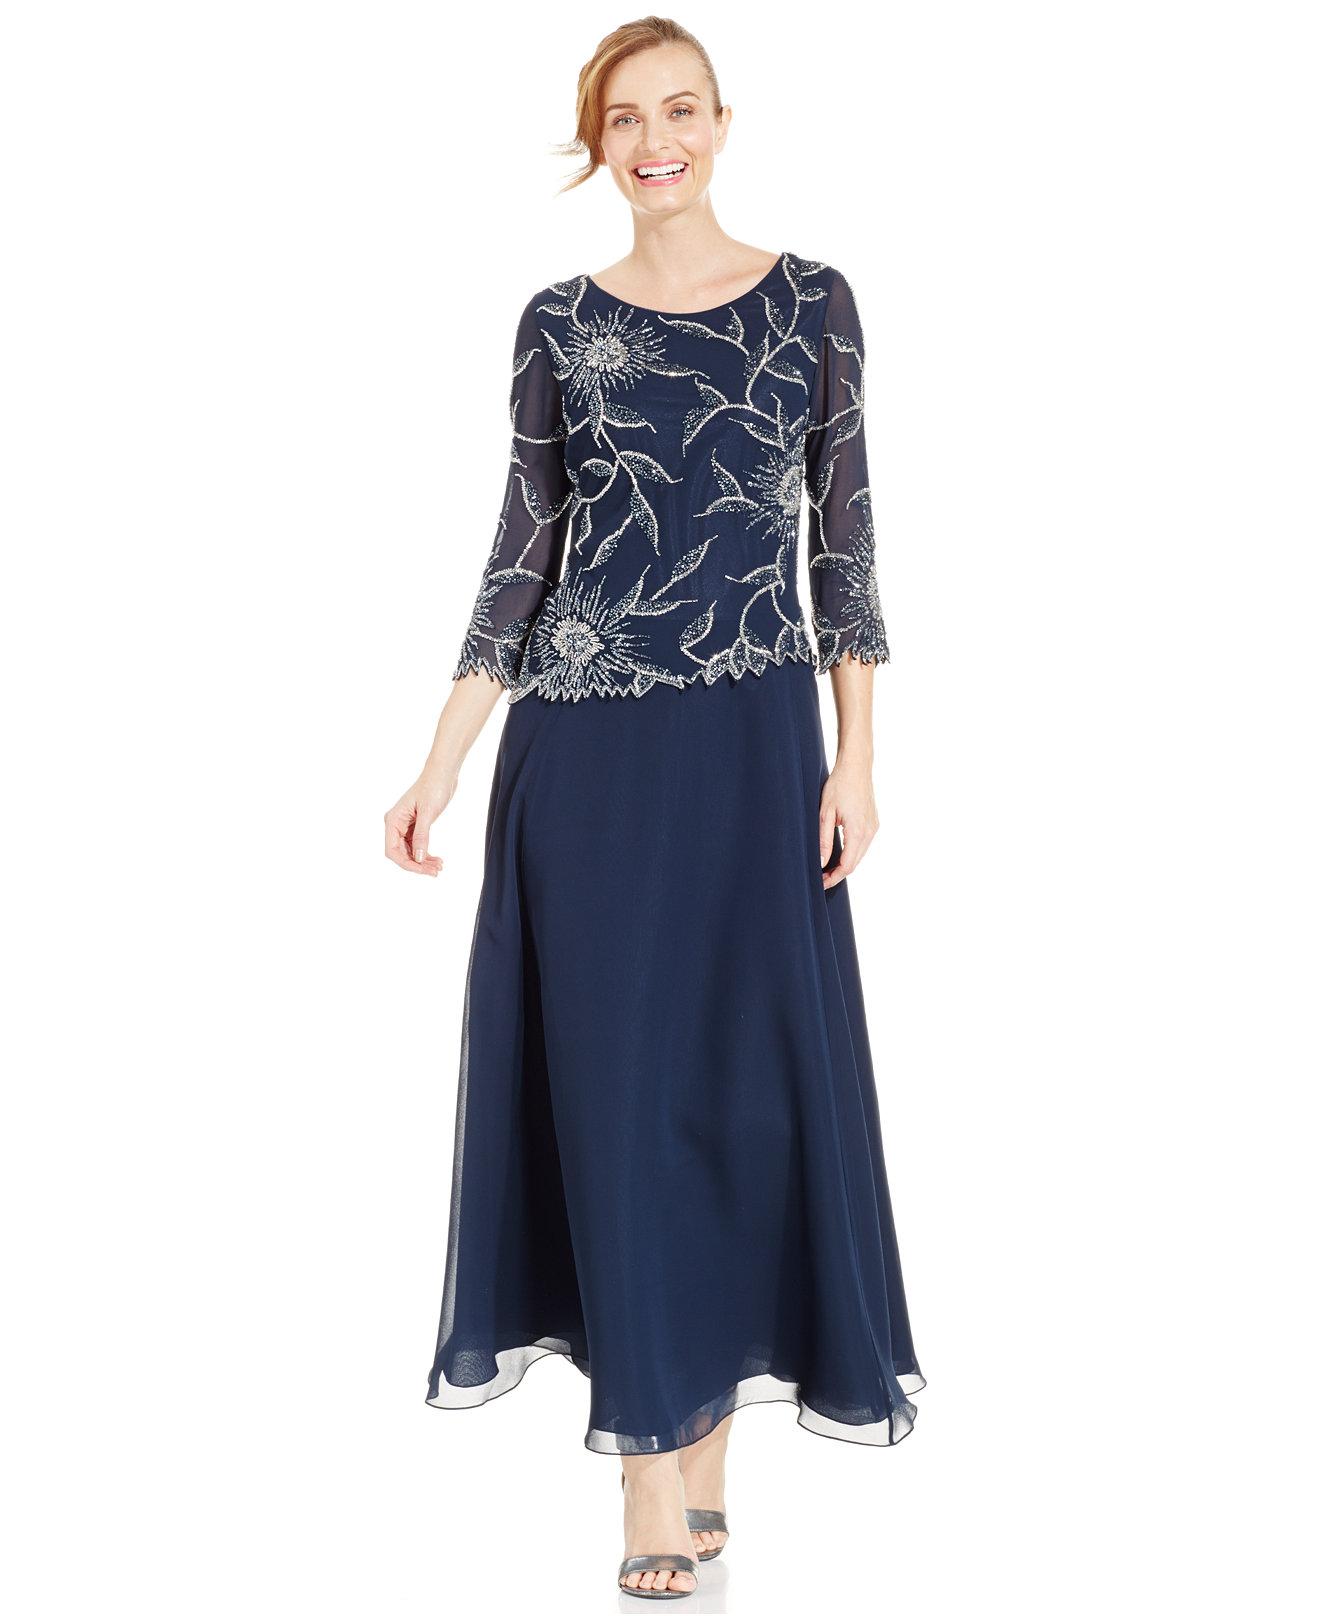 J Kara Plus Size Evening Dresses - Purple Graduation Dresses